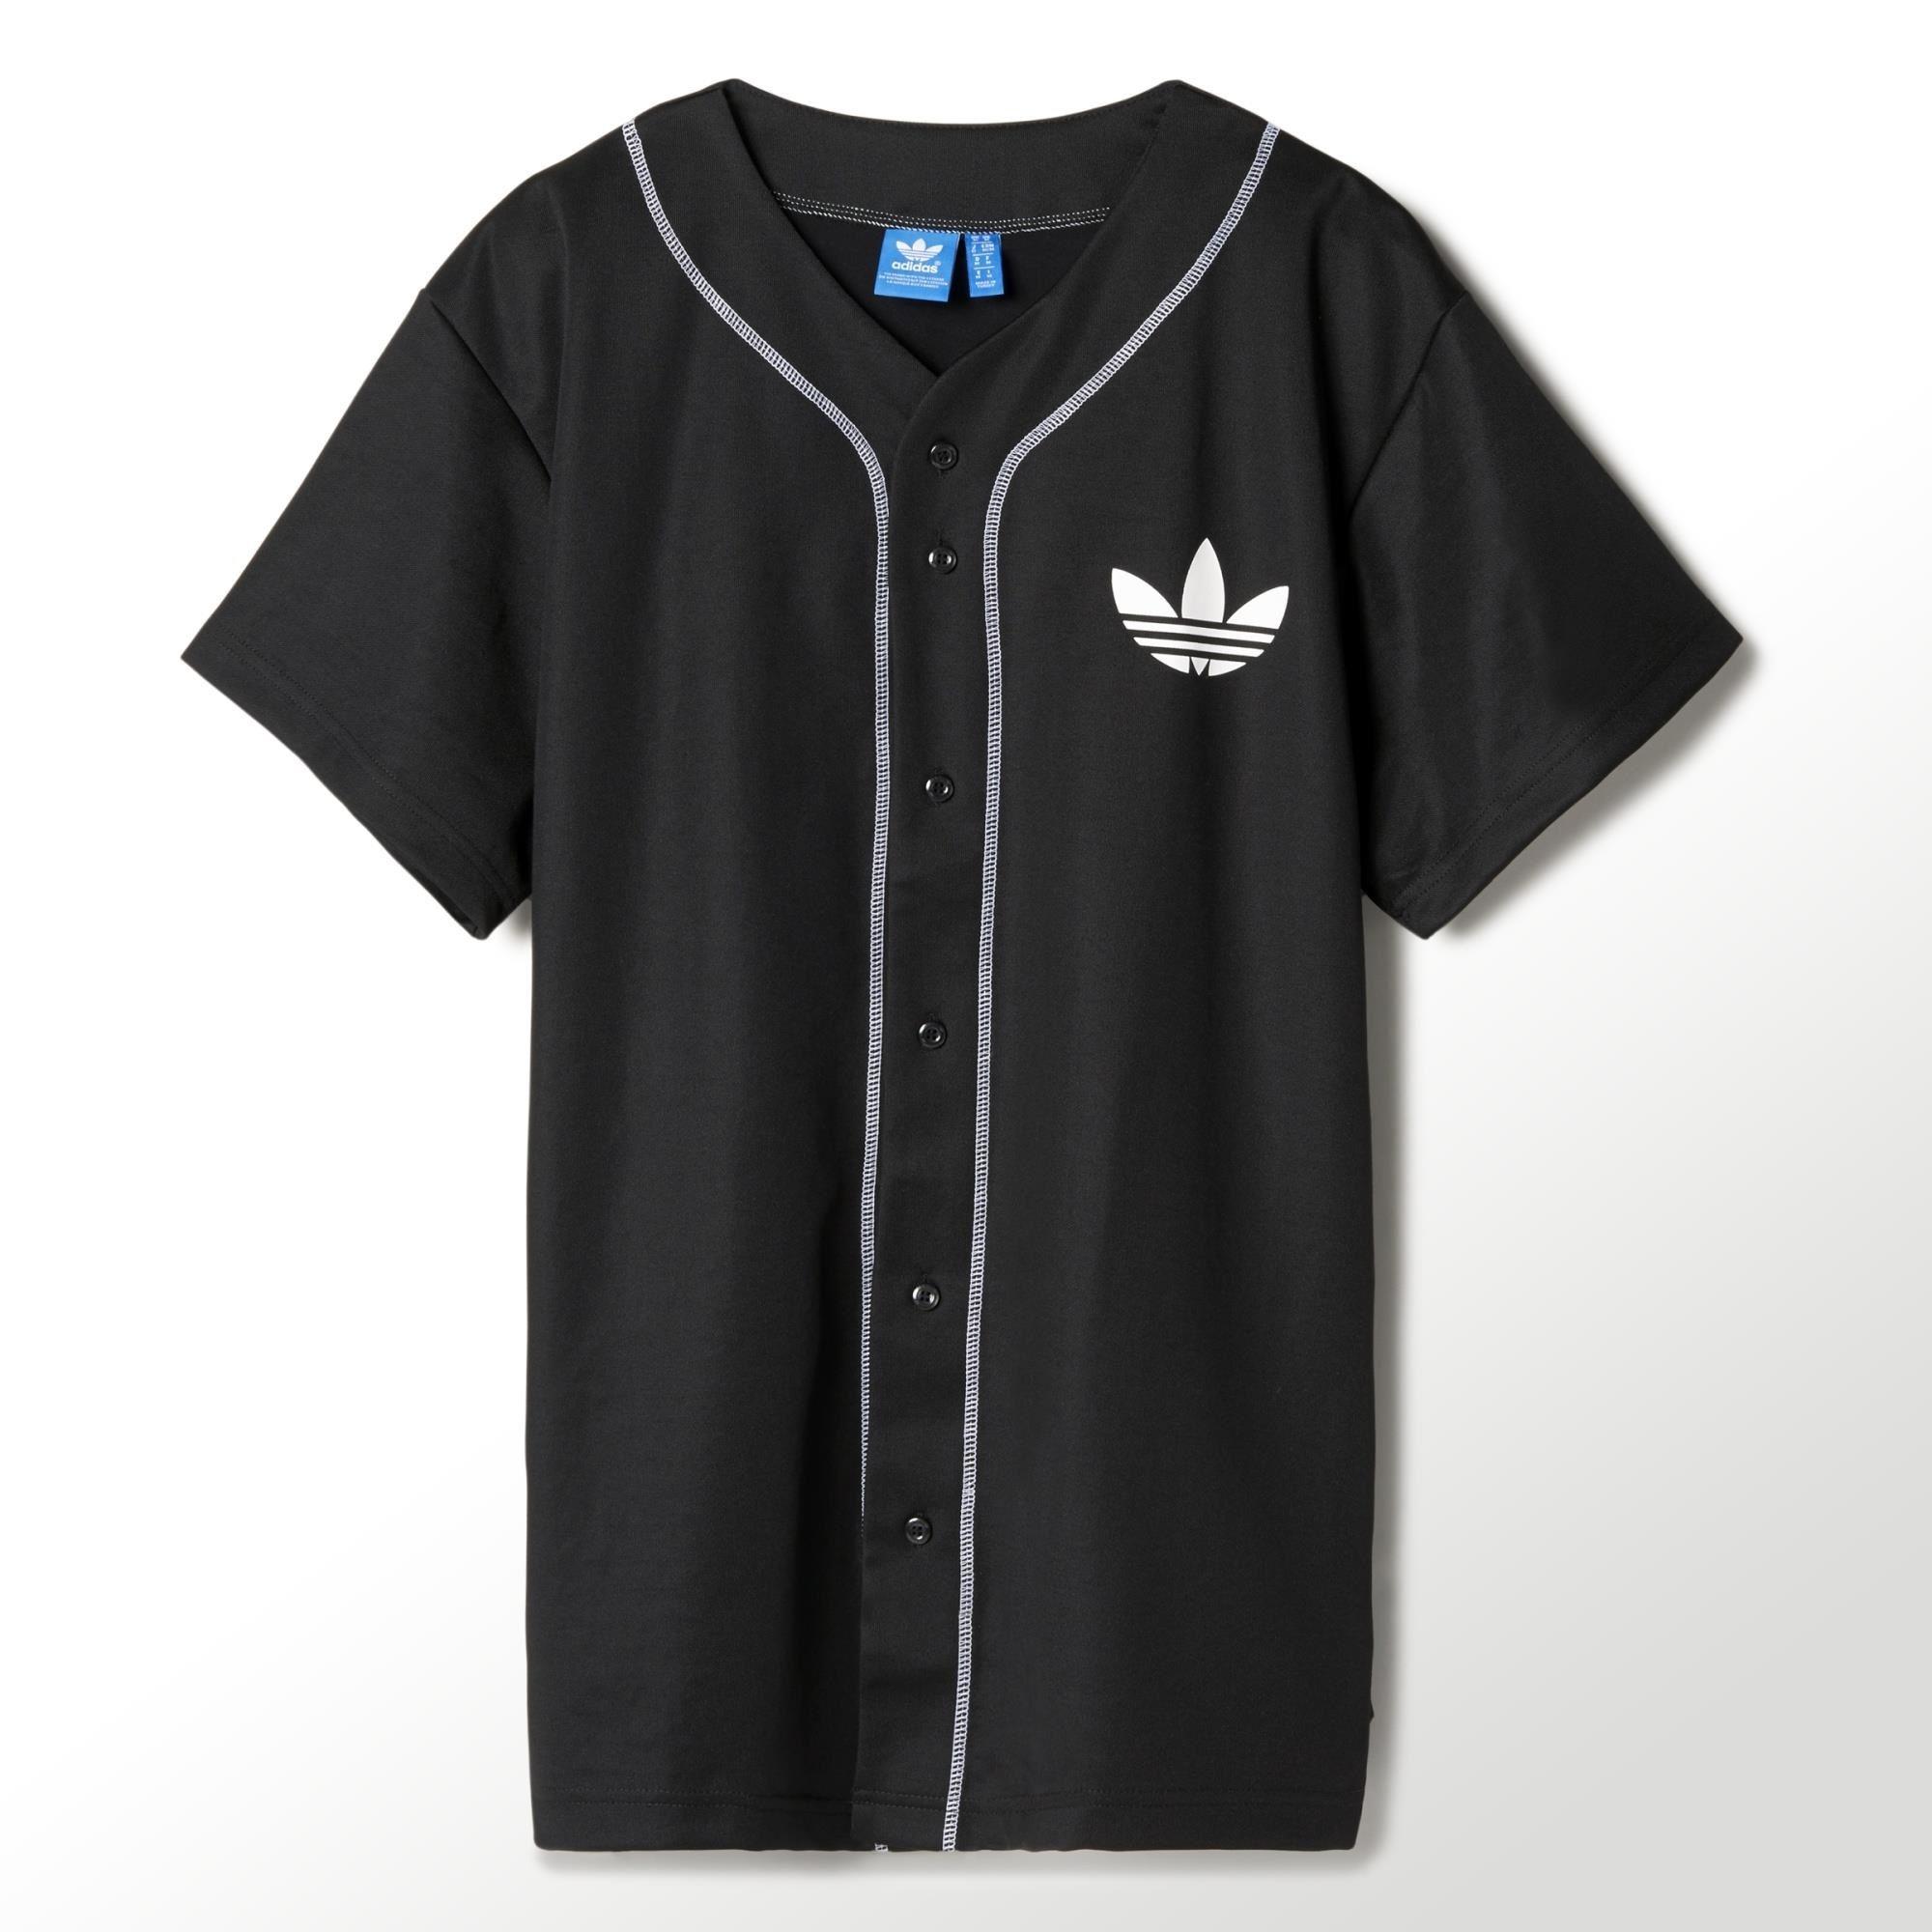 ccd27a10d Camiseta NBA Brooklyn Nets Baseball adidas